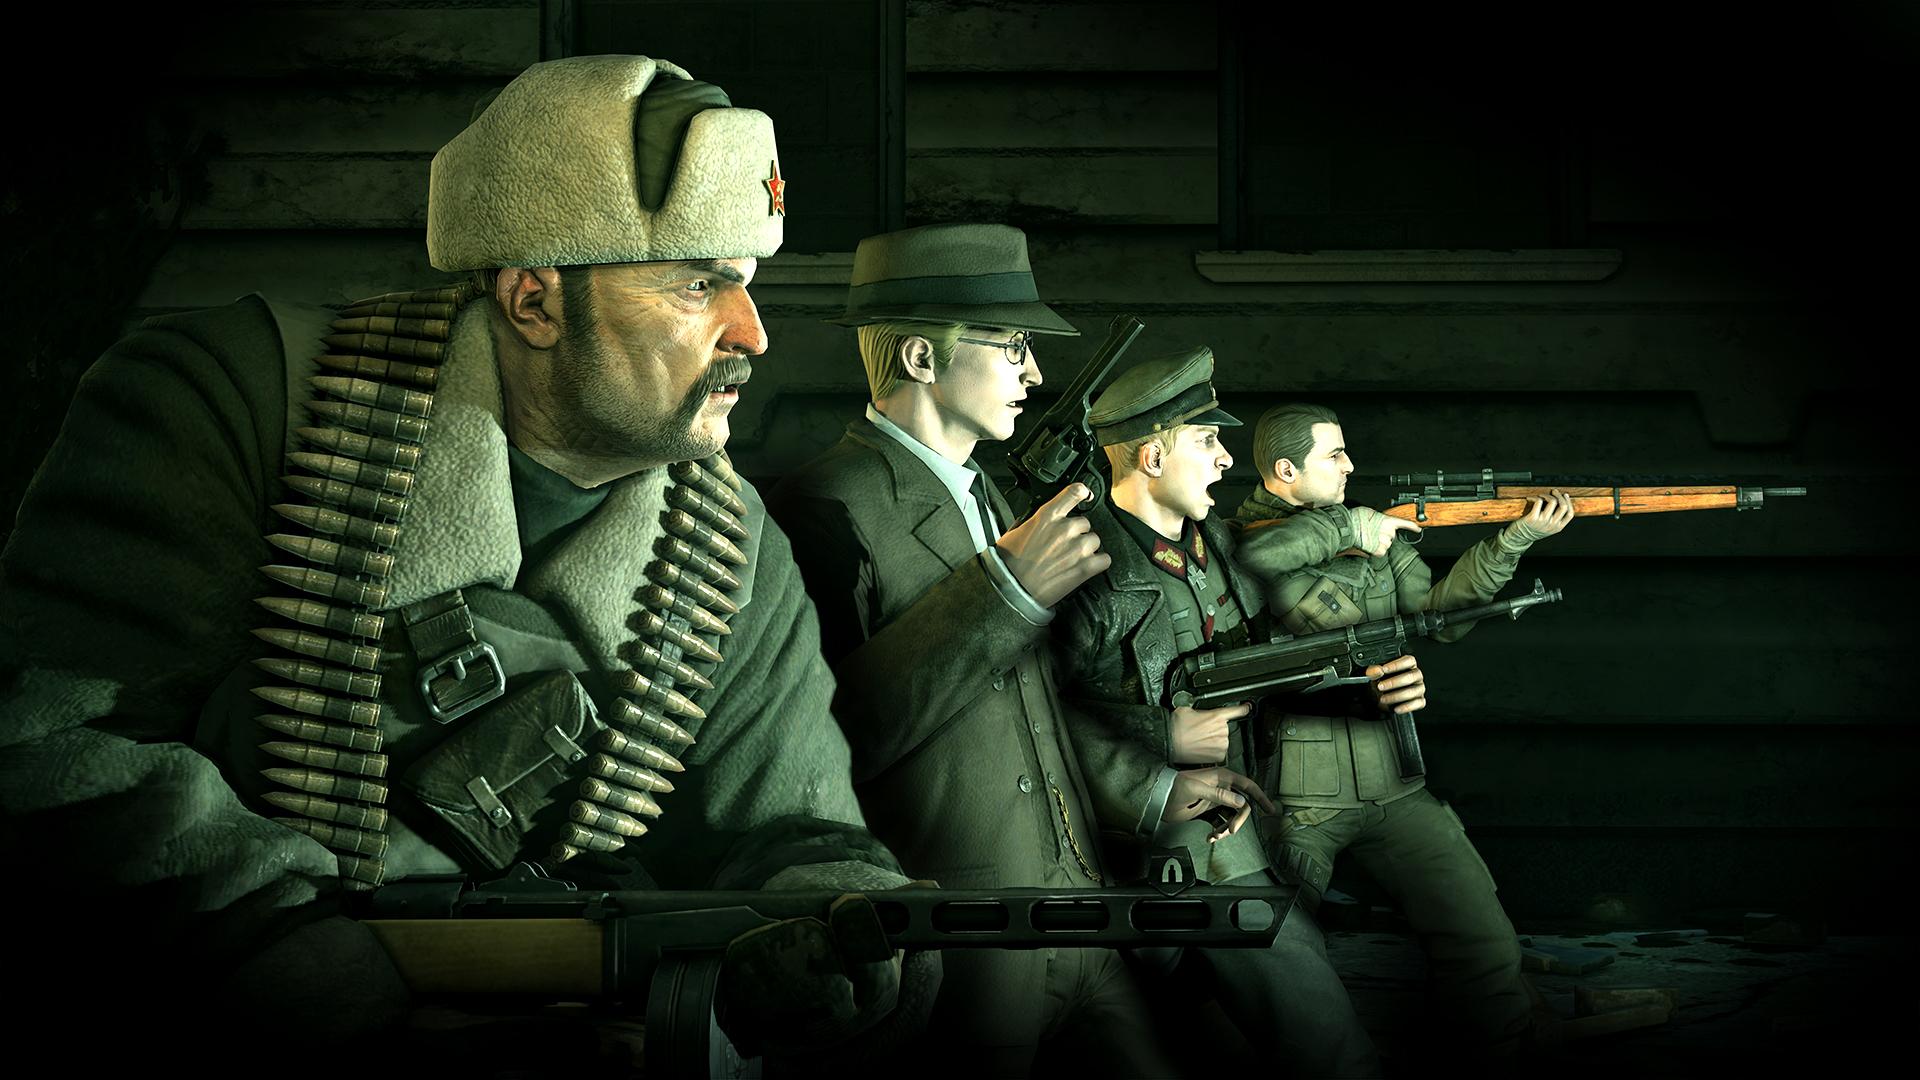 Sniper Elite: Nazi Zombie Army screenshot